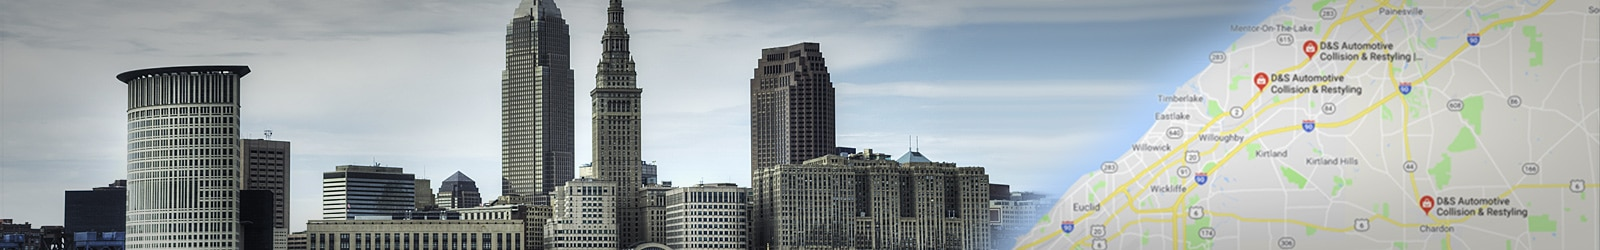 Cleveland NE Locations